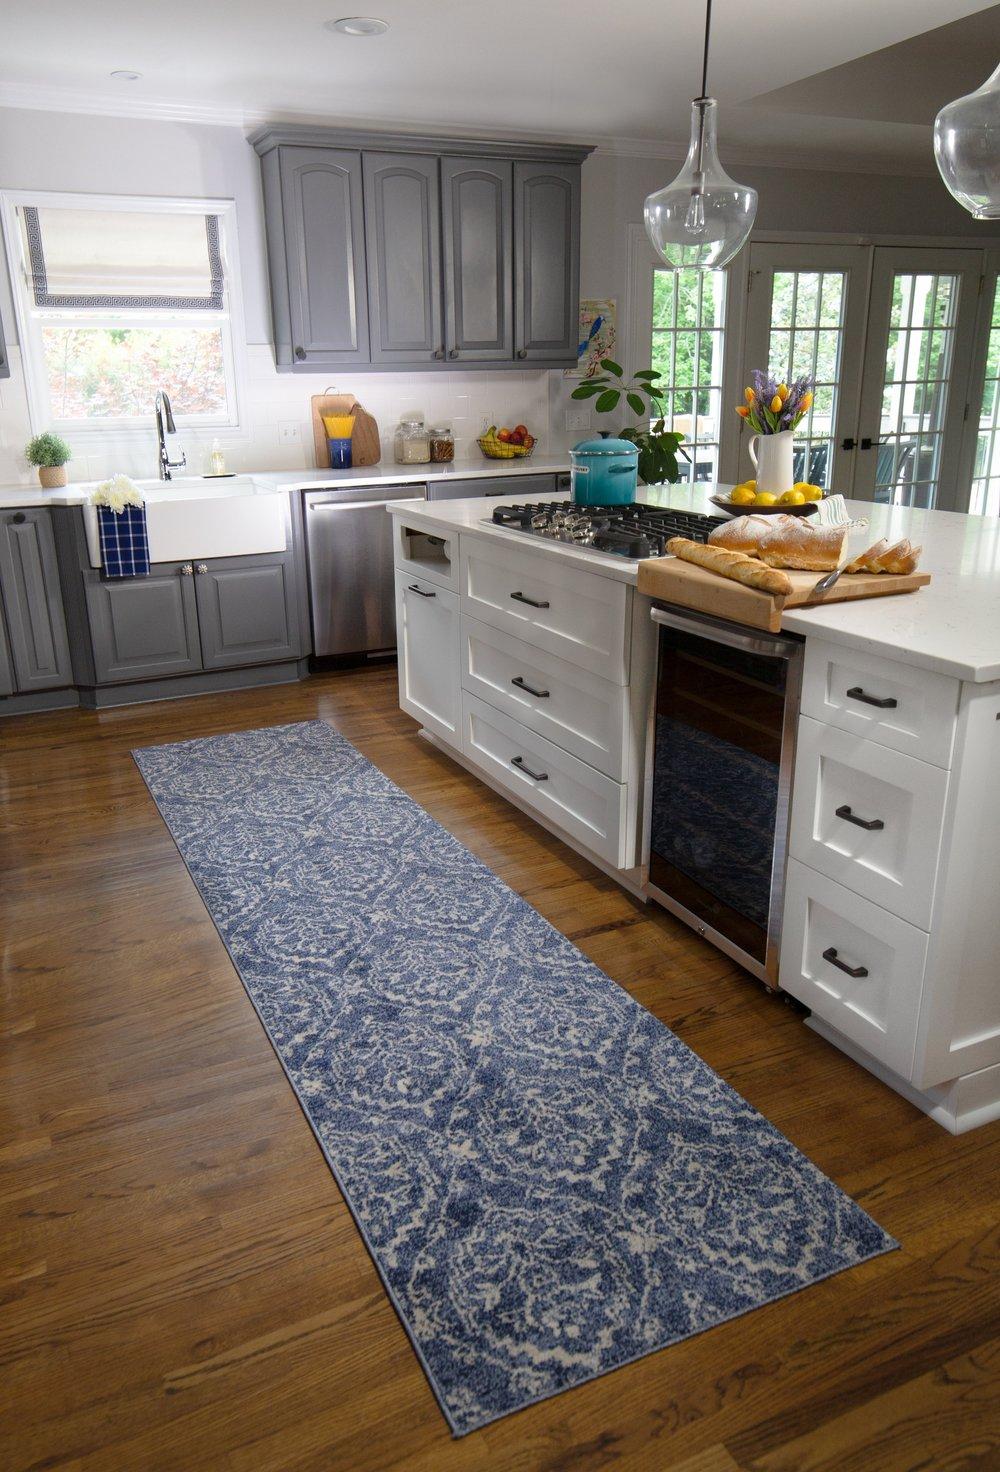 4 Kitchen Runner 2.jpg